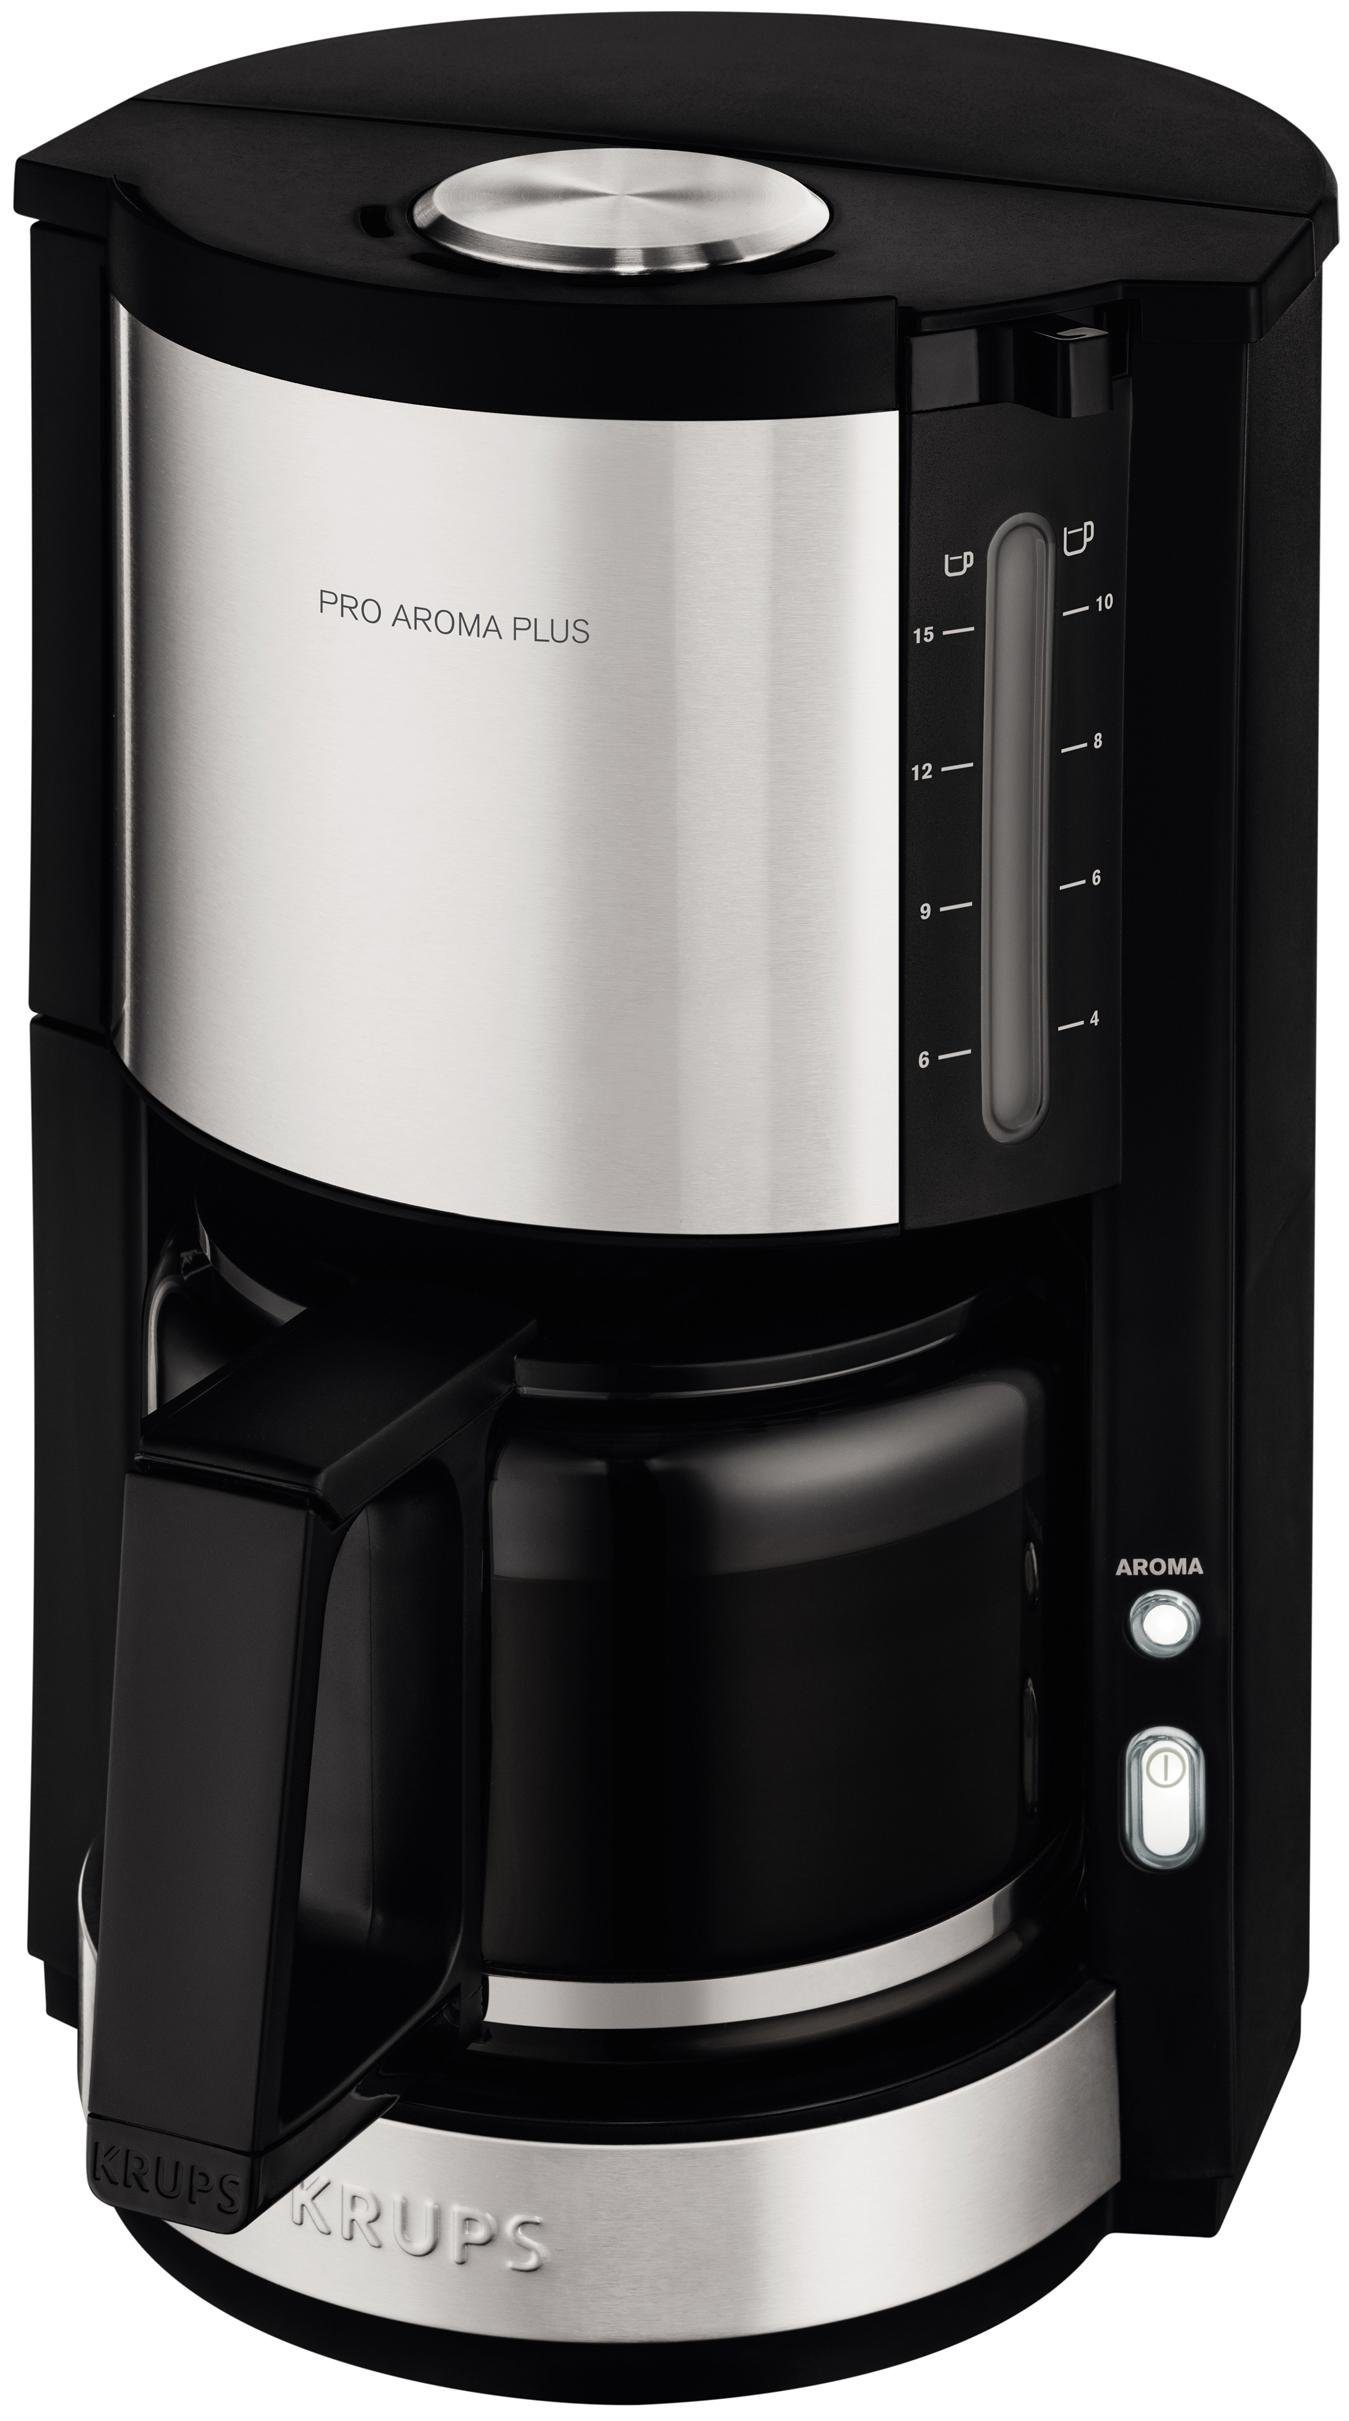 Krups Glaskannen-Kaffeemaschine ProAroma Plus KM321, edelstahl-schwarz